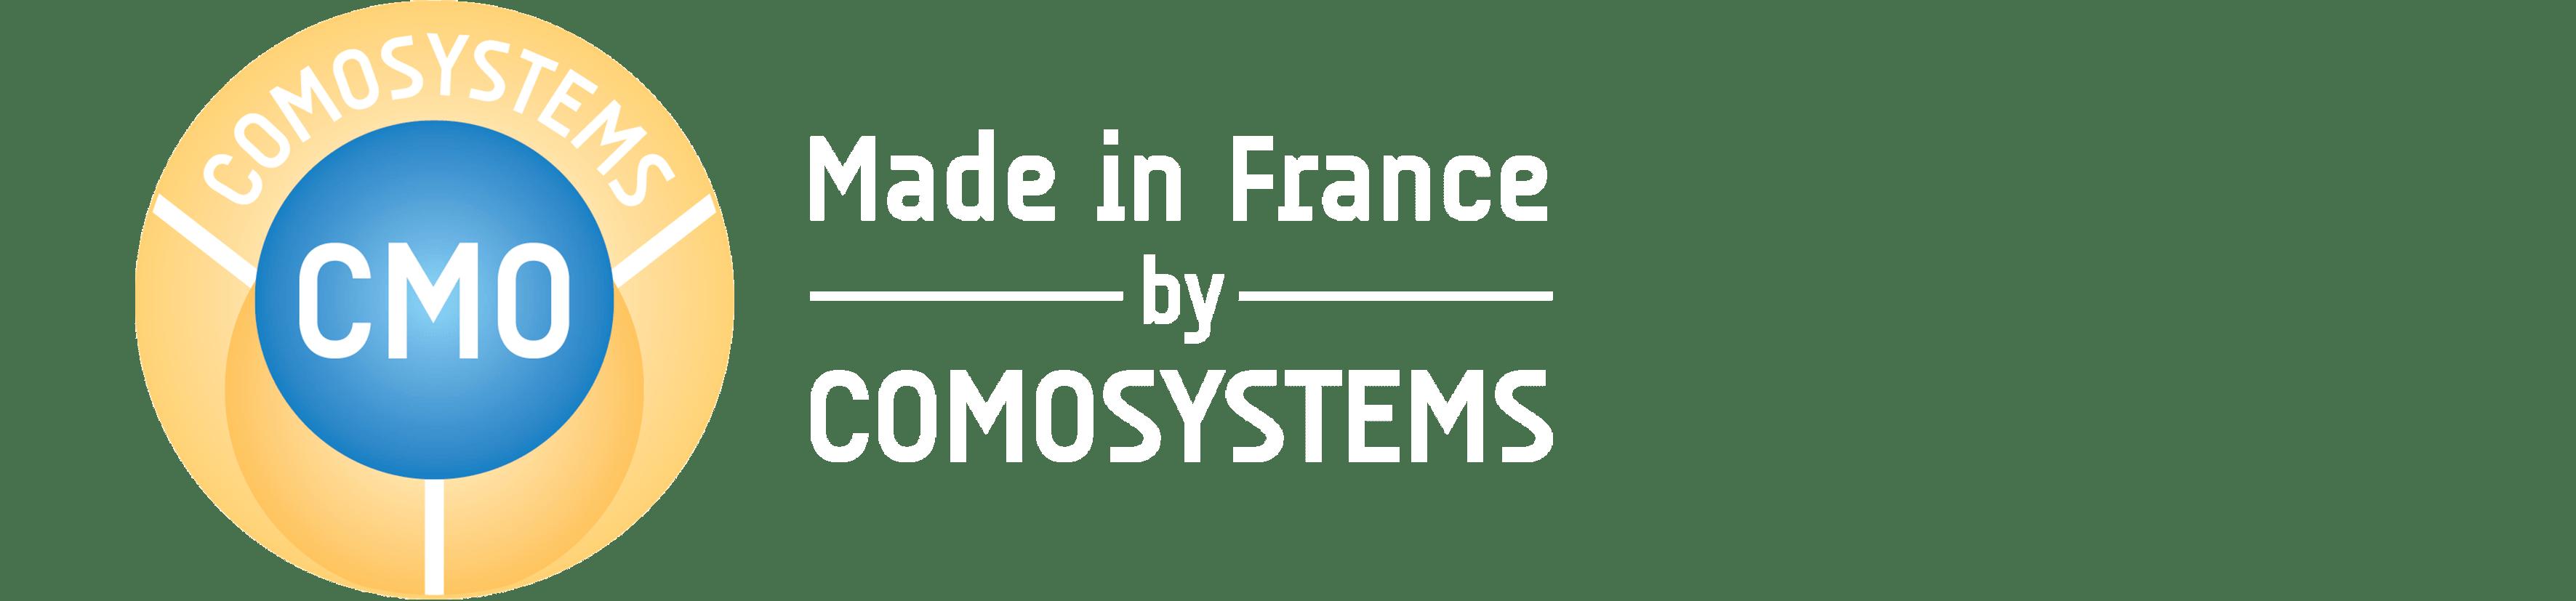 Biohacking Comosystems